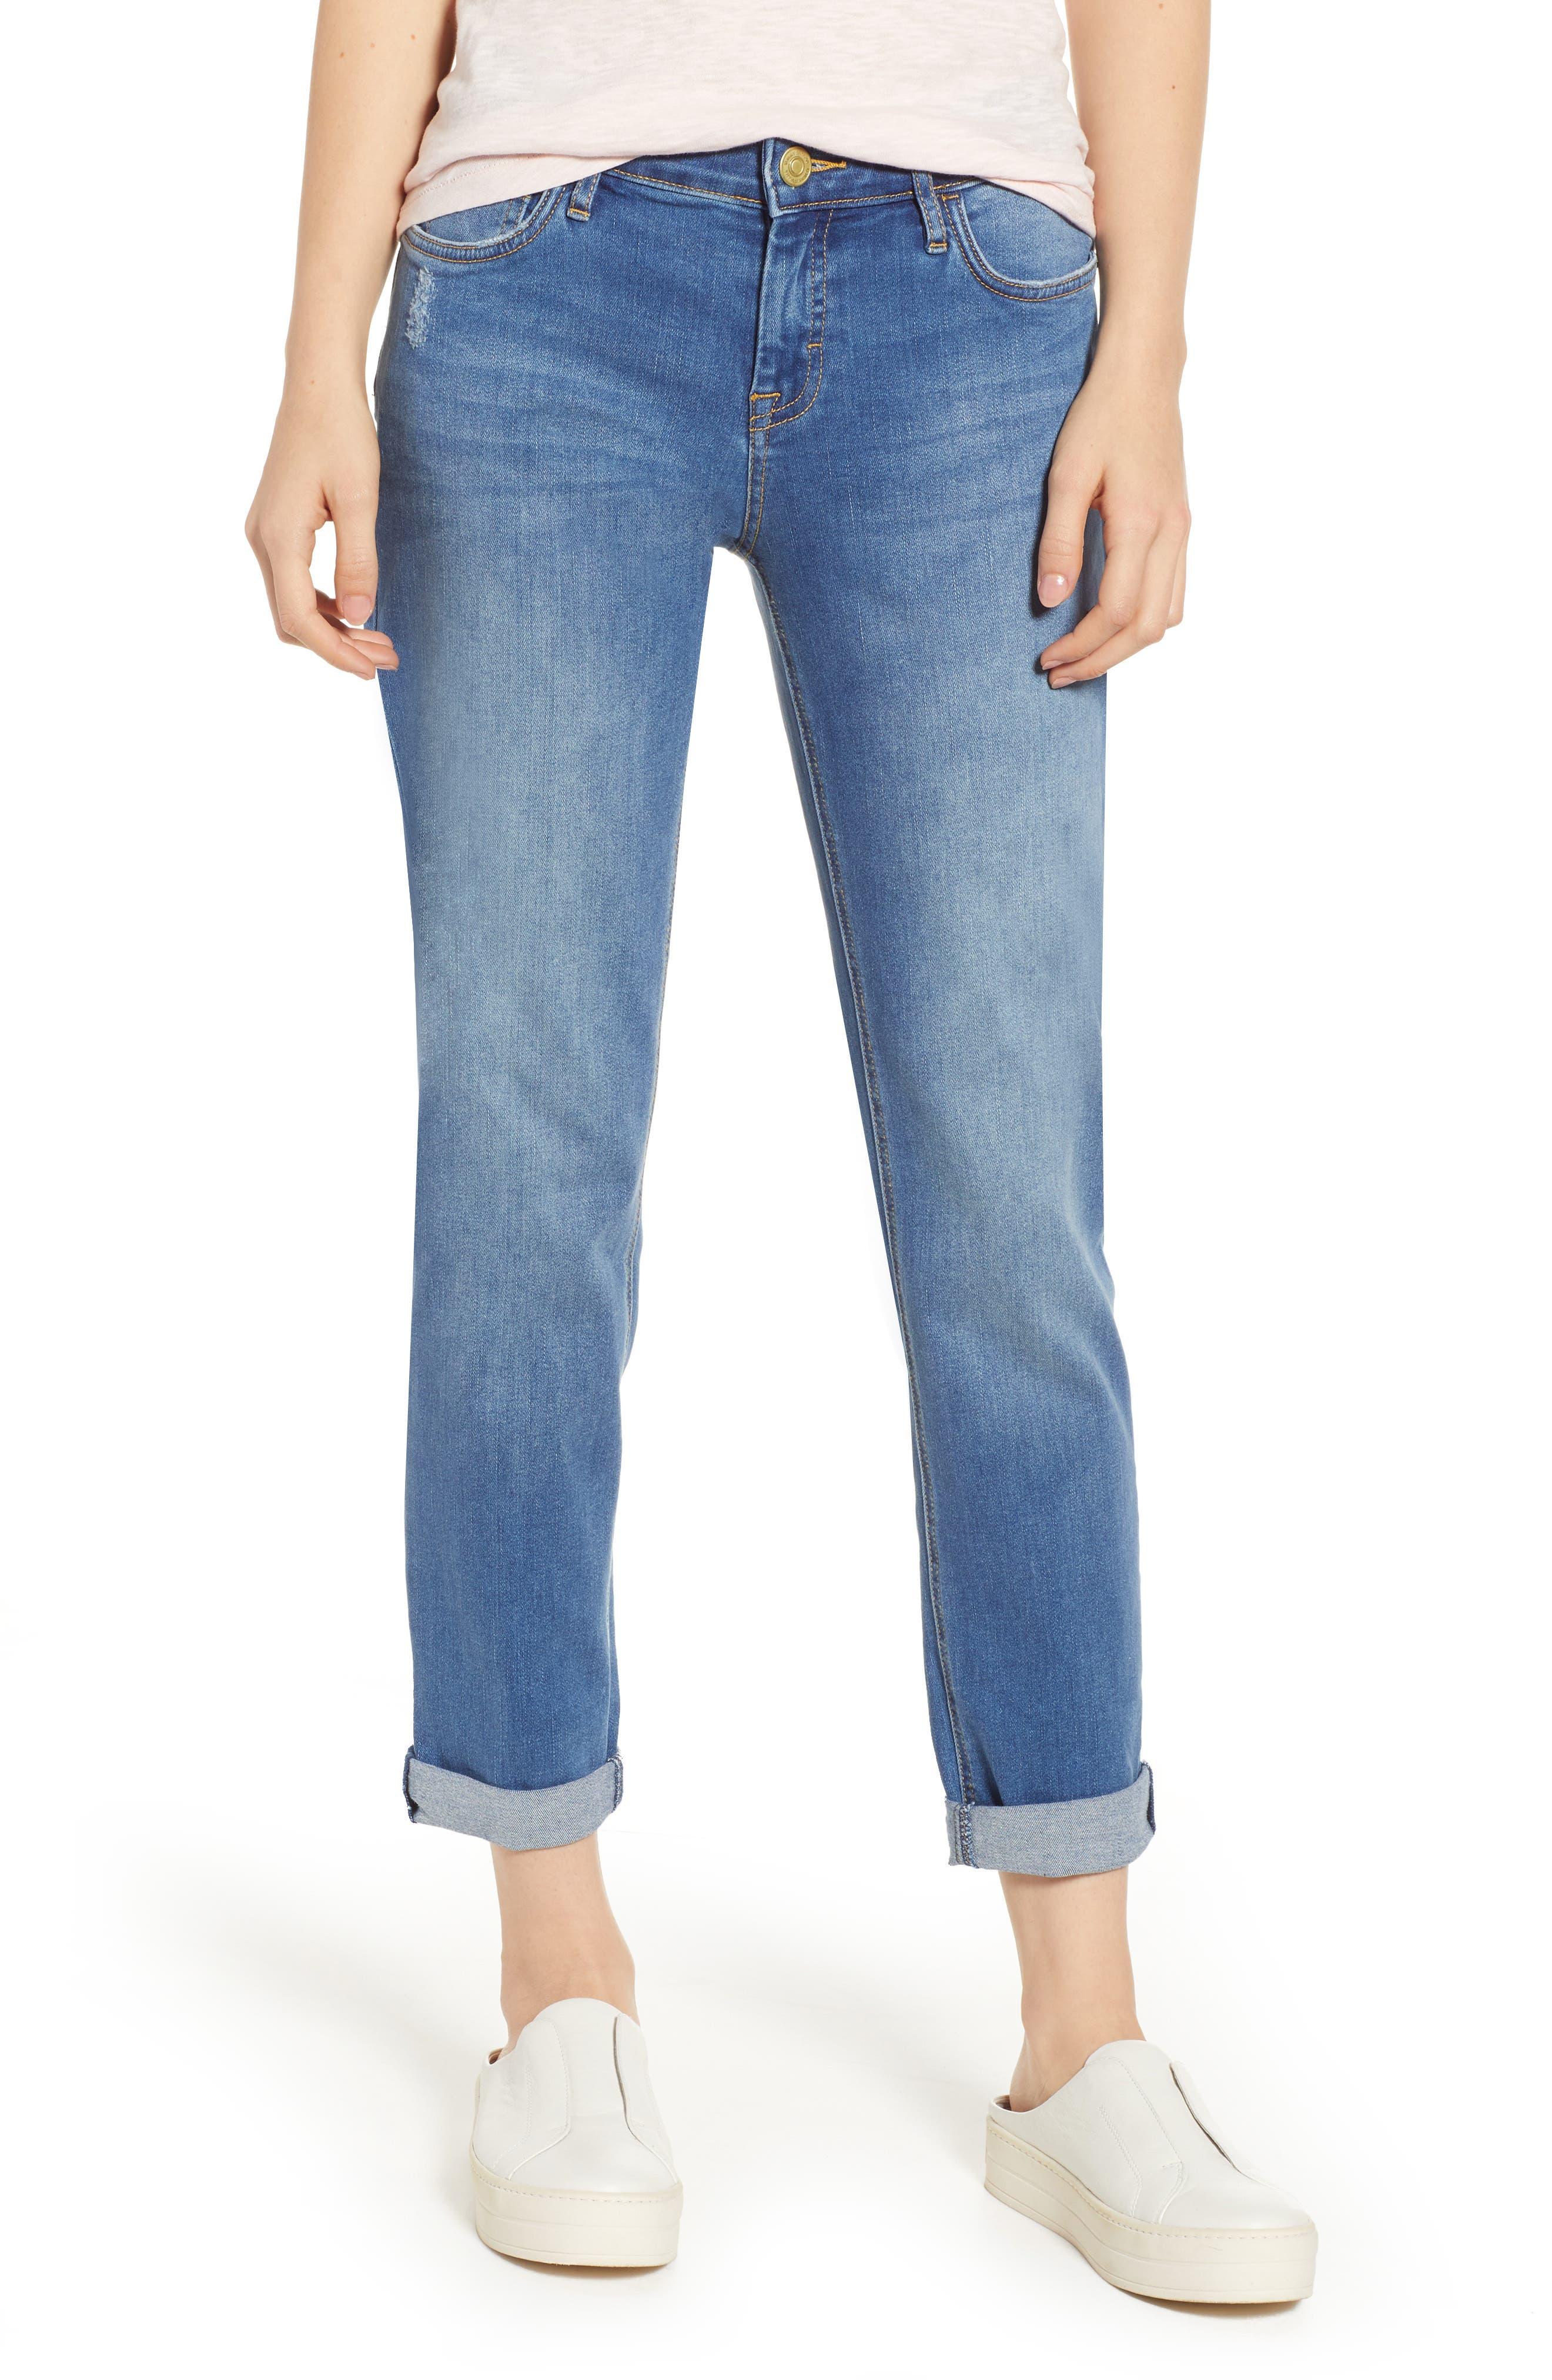 Tema Slim Boyfriend Jeans,                             Main thumbnail 1, color,                             407